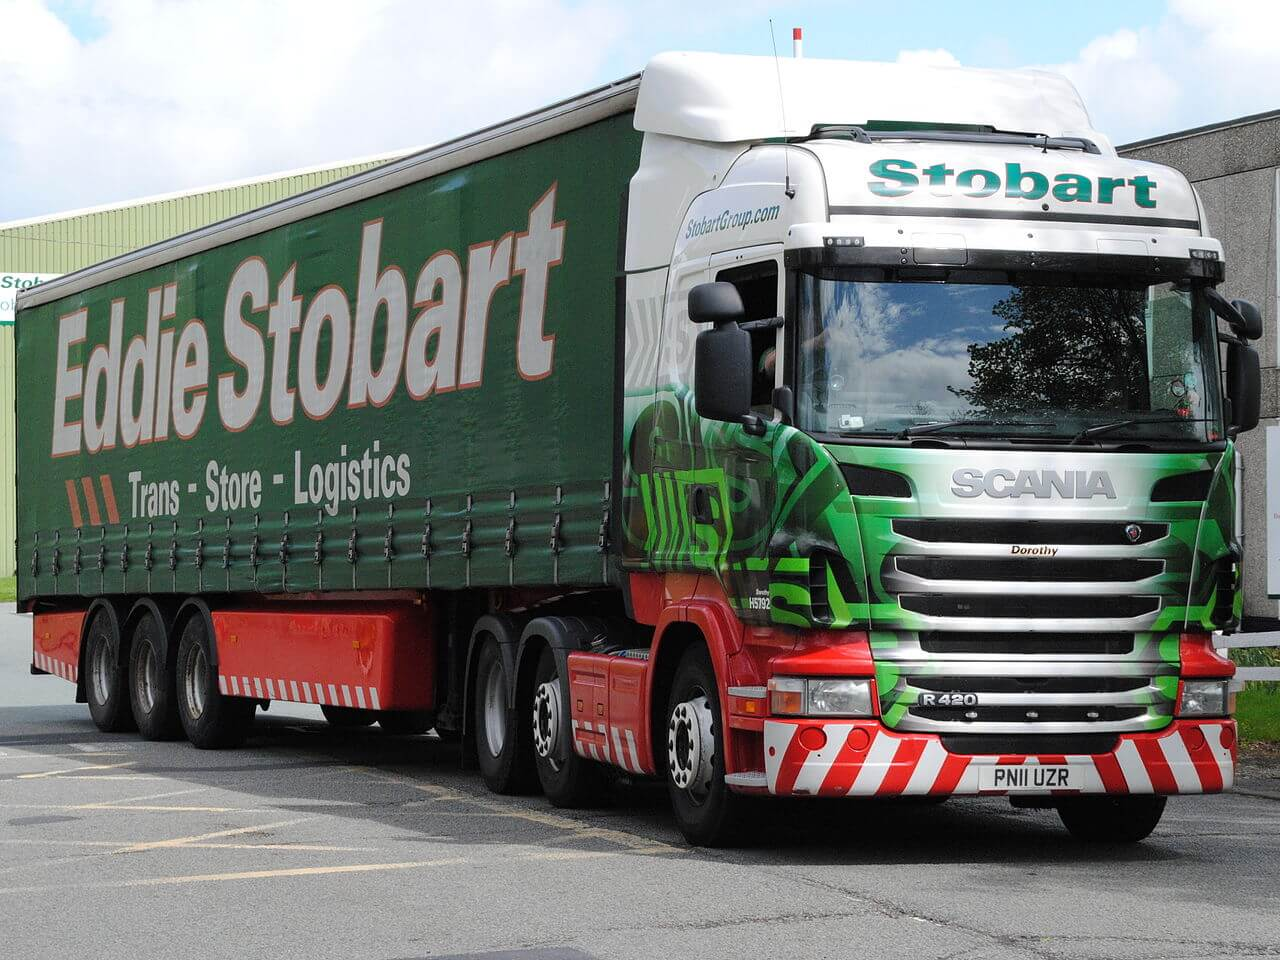 Eddie Stobart drivers to decide on strike action next week